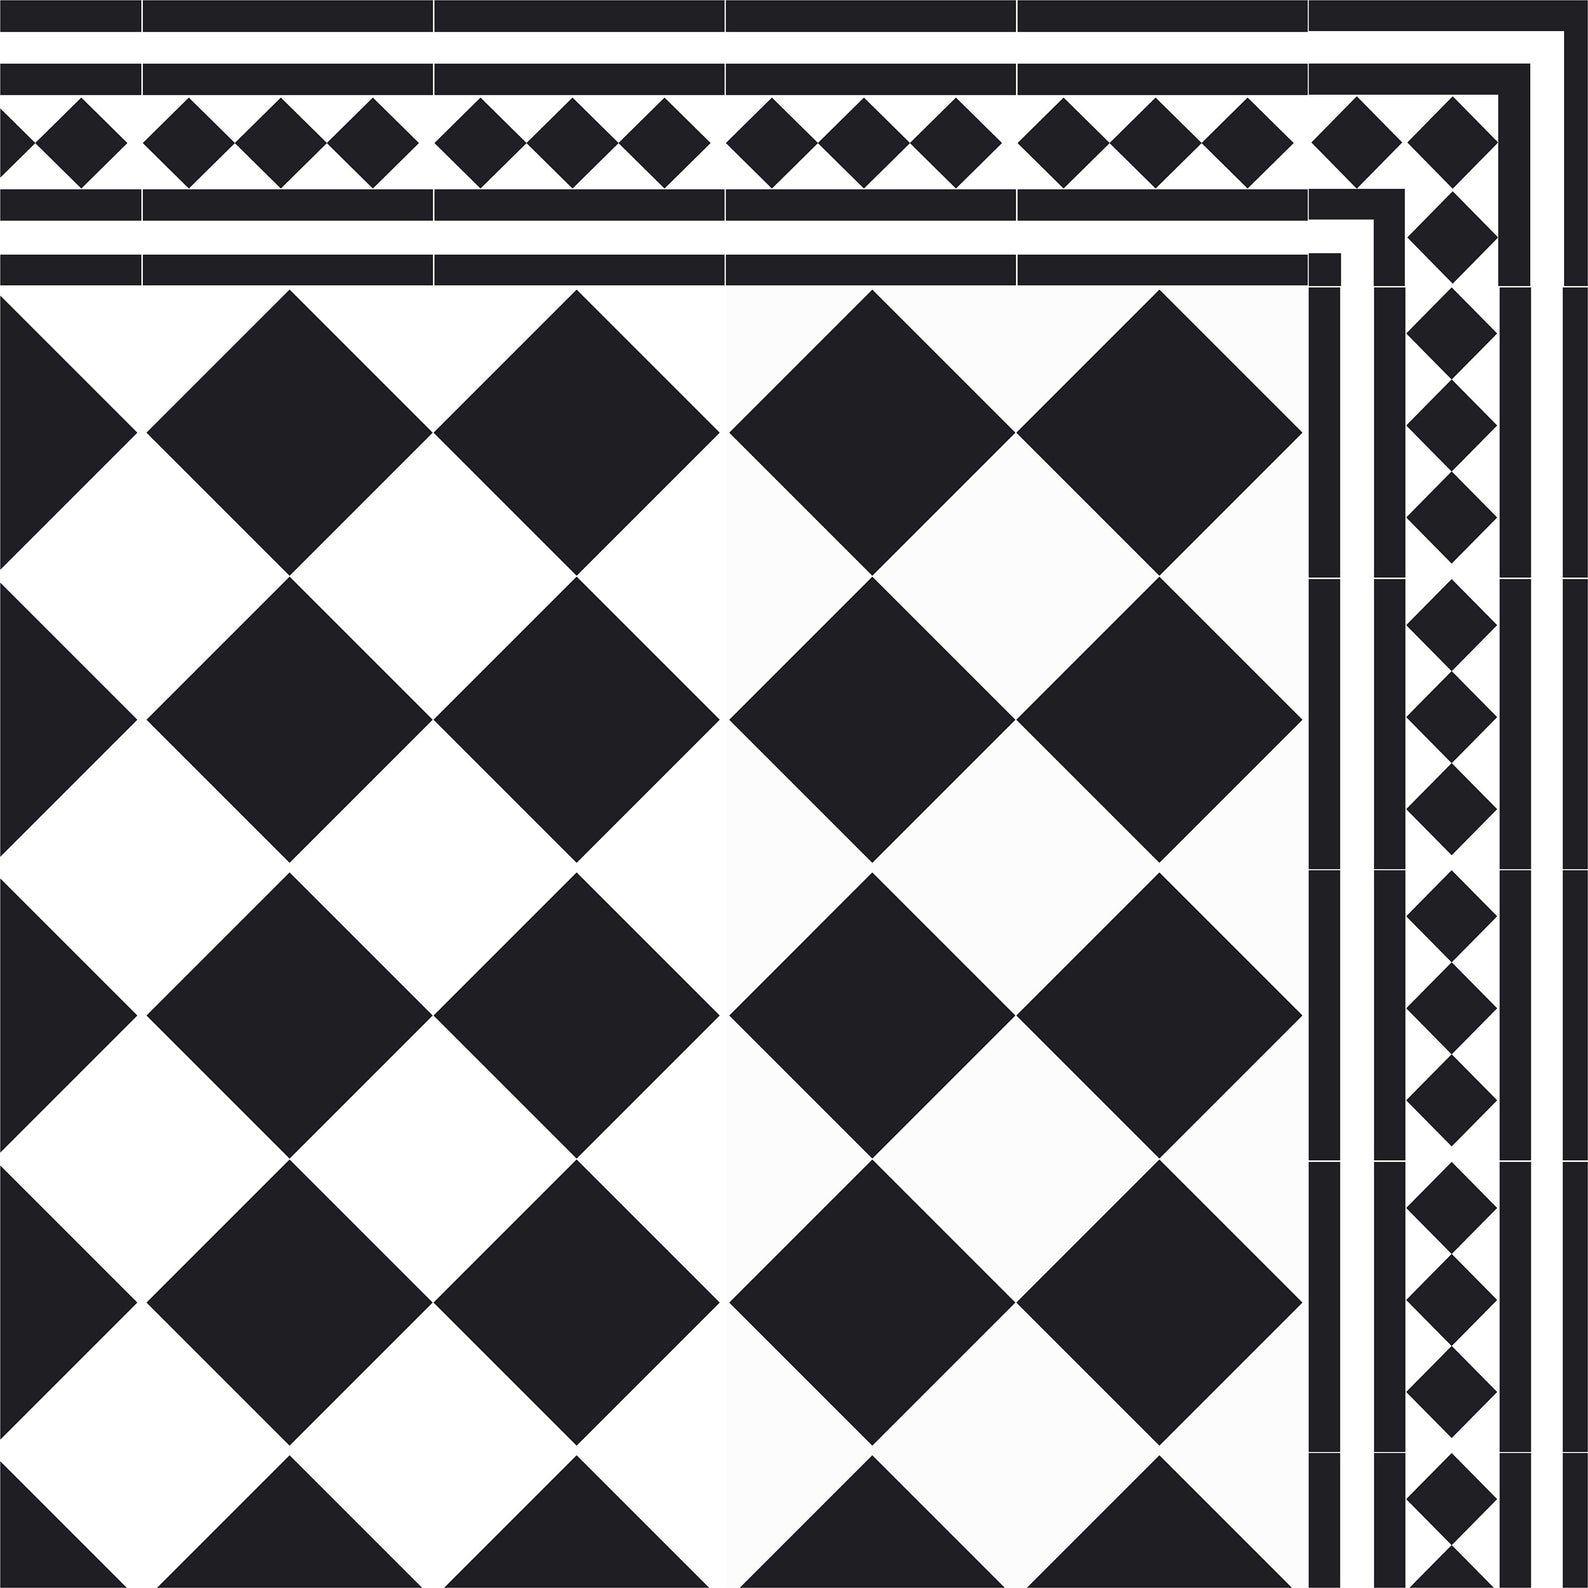 Black White Vinyl Mat Kitchen Mat Geometric Tiles Decor Etsy Kitchen Mat Decorative Tile Custom Size Rugs